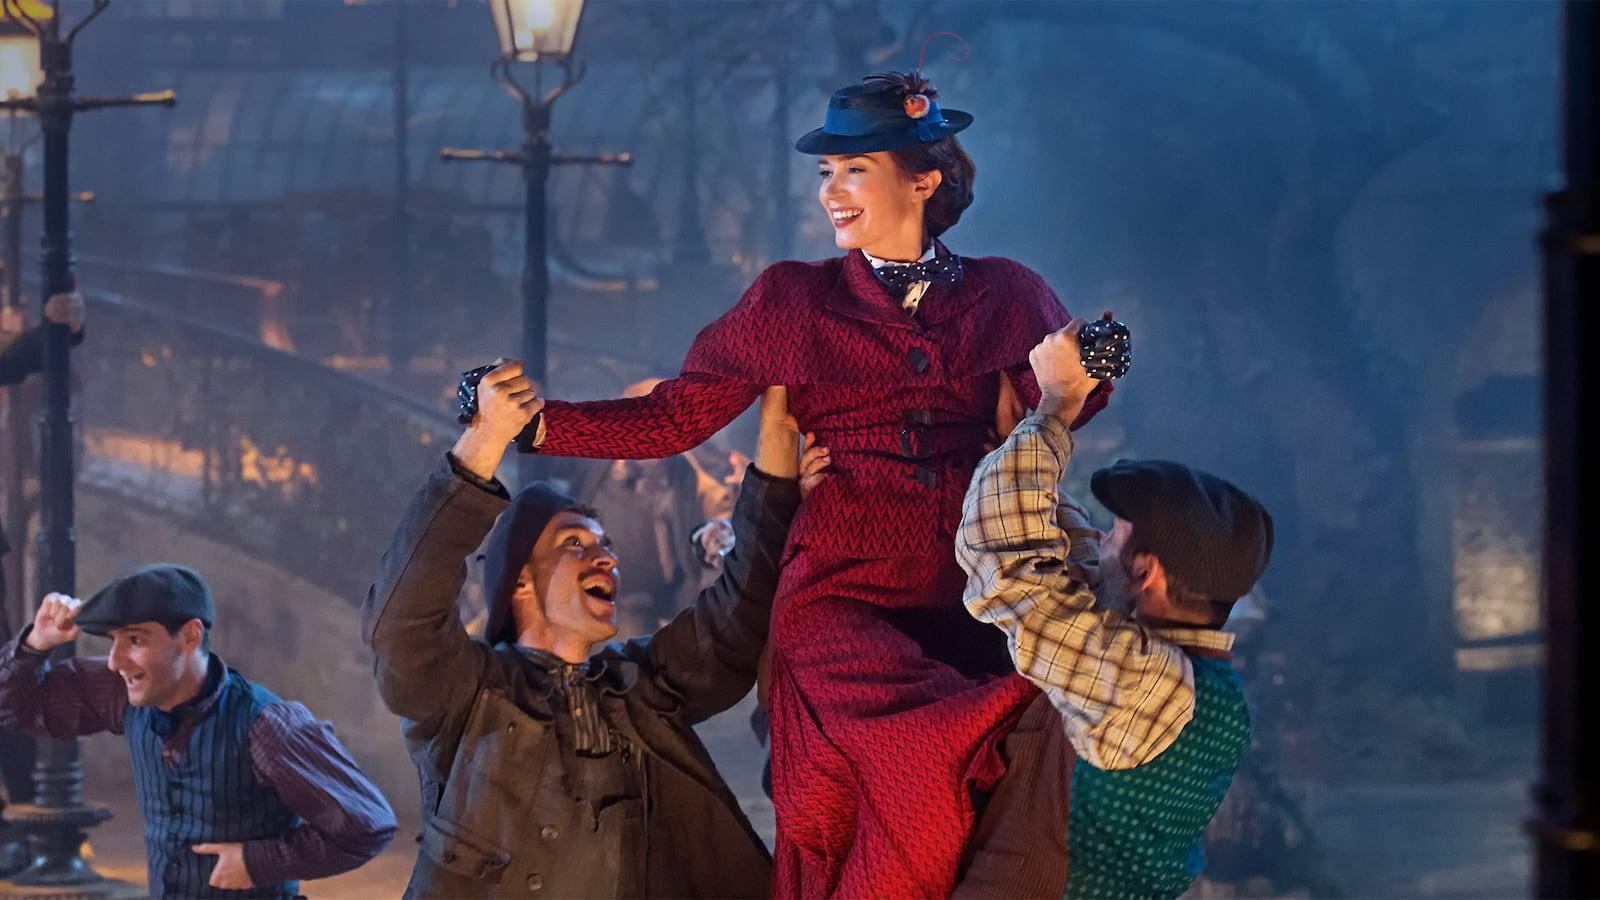 mary-poppins-vender-tilbage-2018